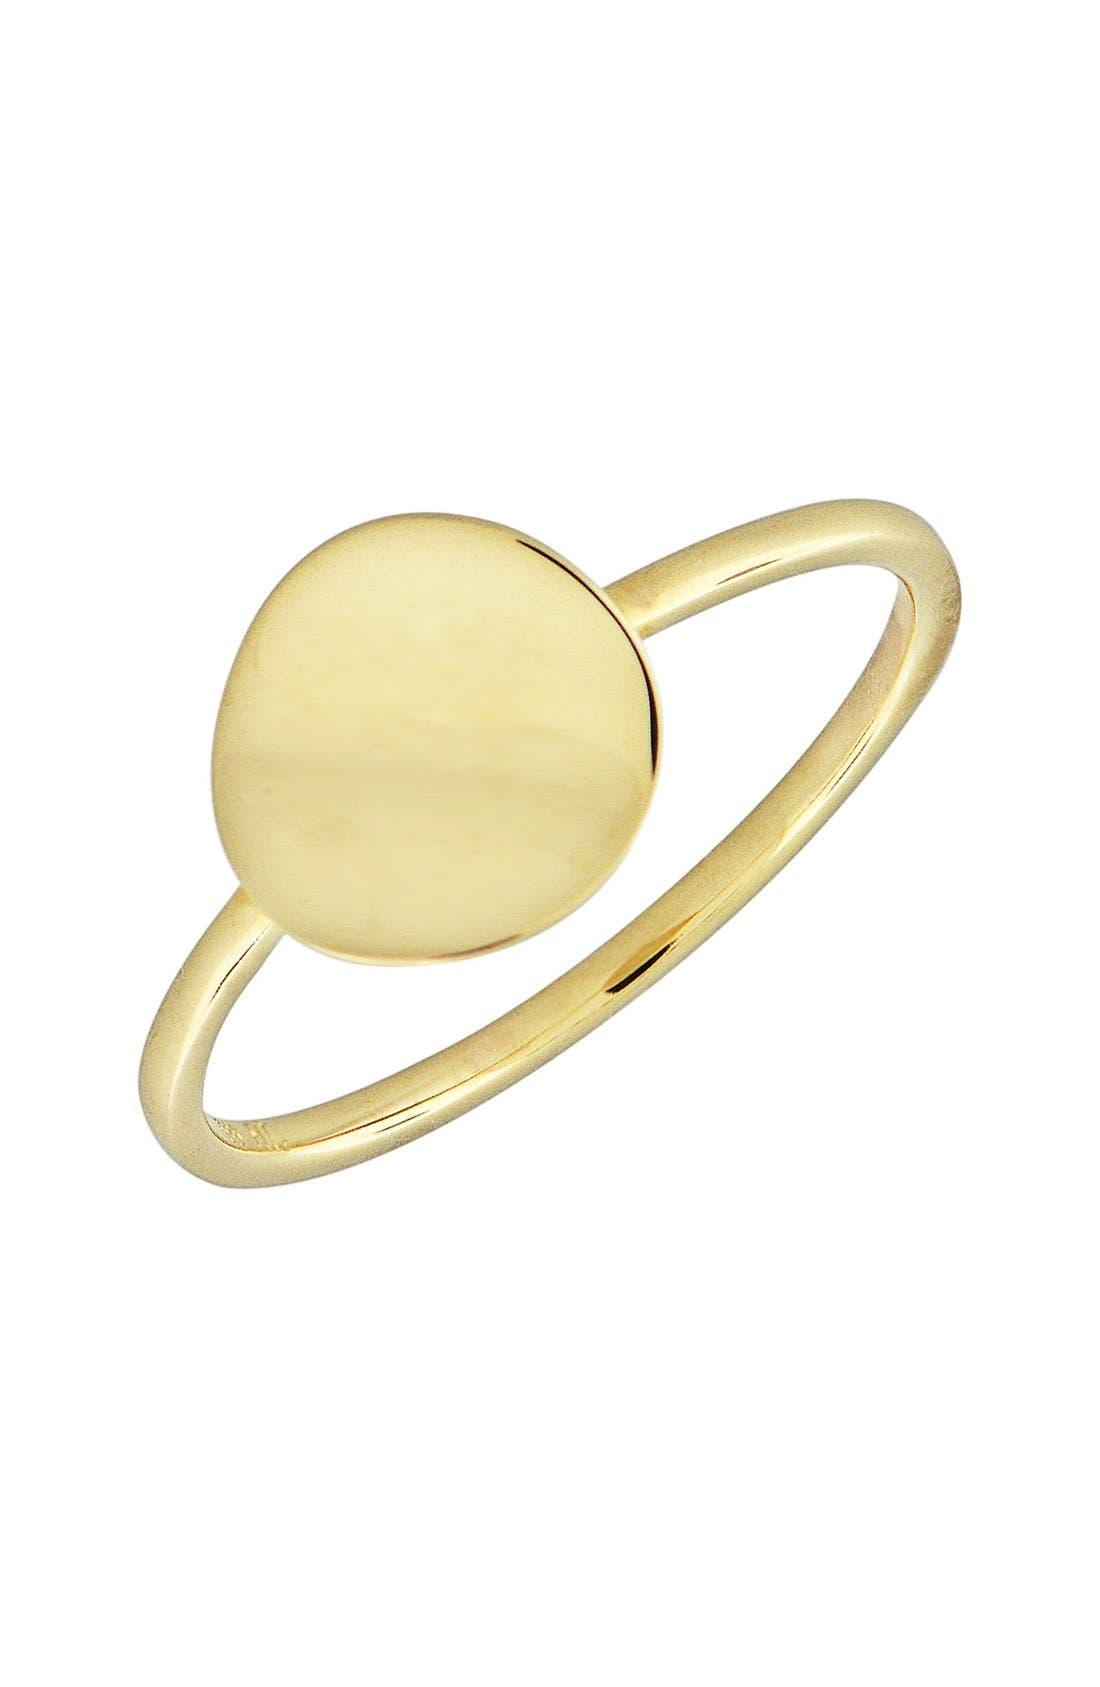 14k Gold Concave Disc Ring,                             Main thumbnail 1, color,